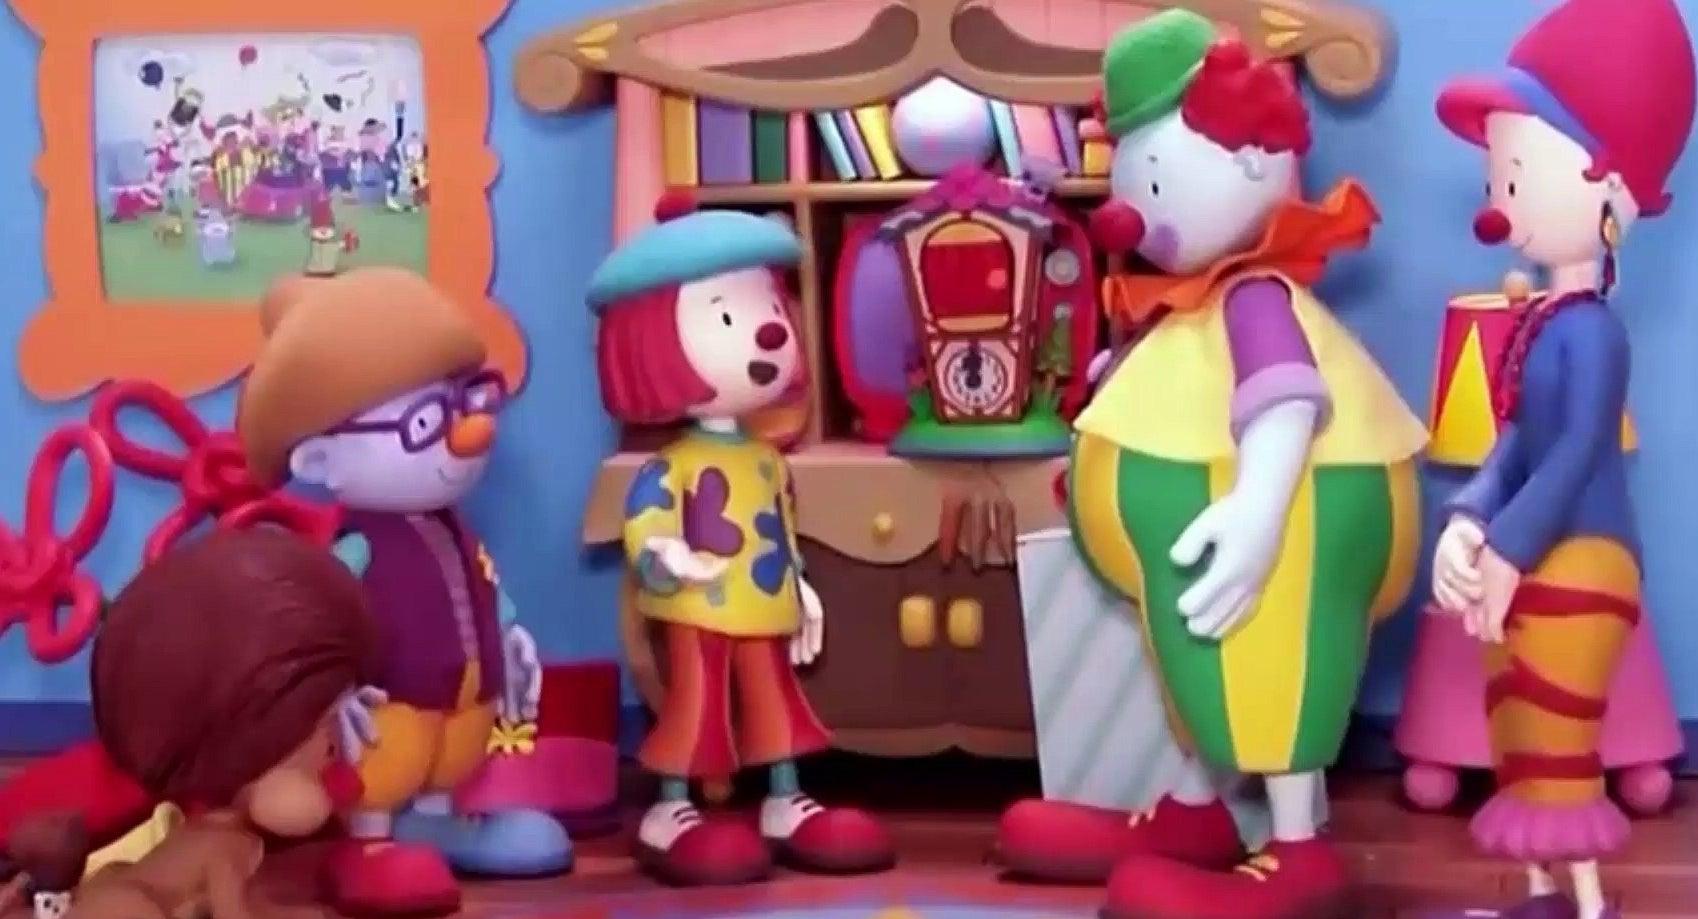 Animated clowns